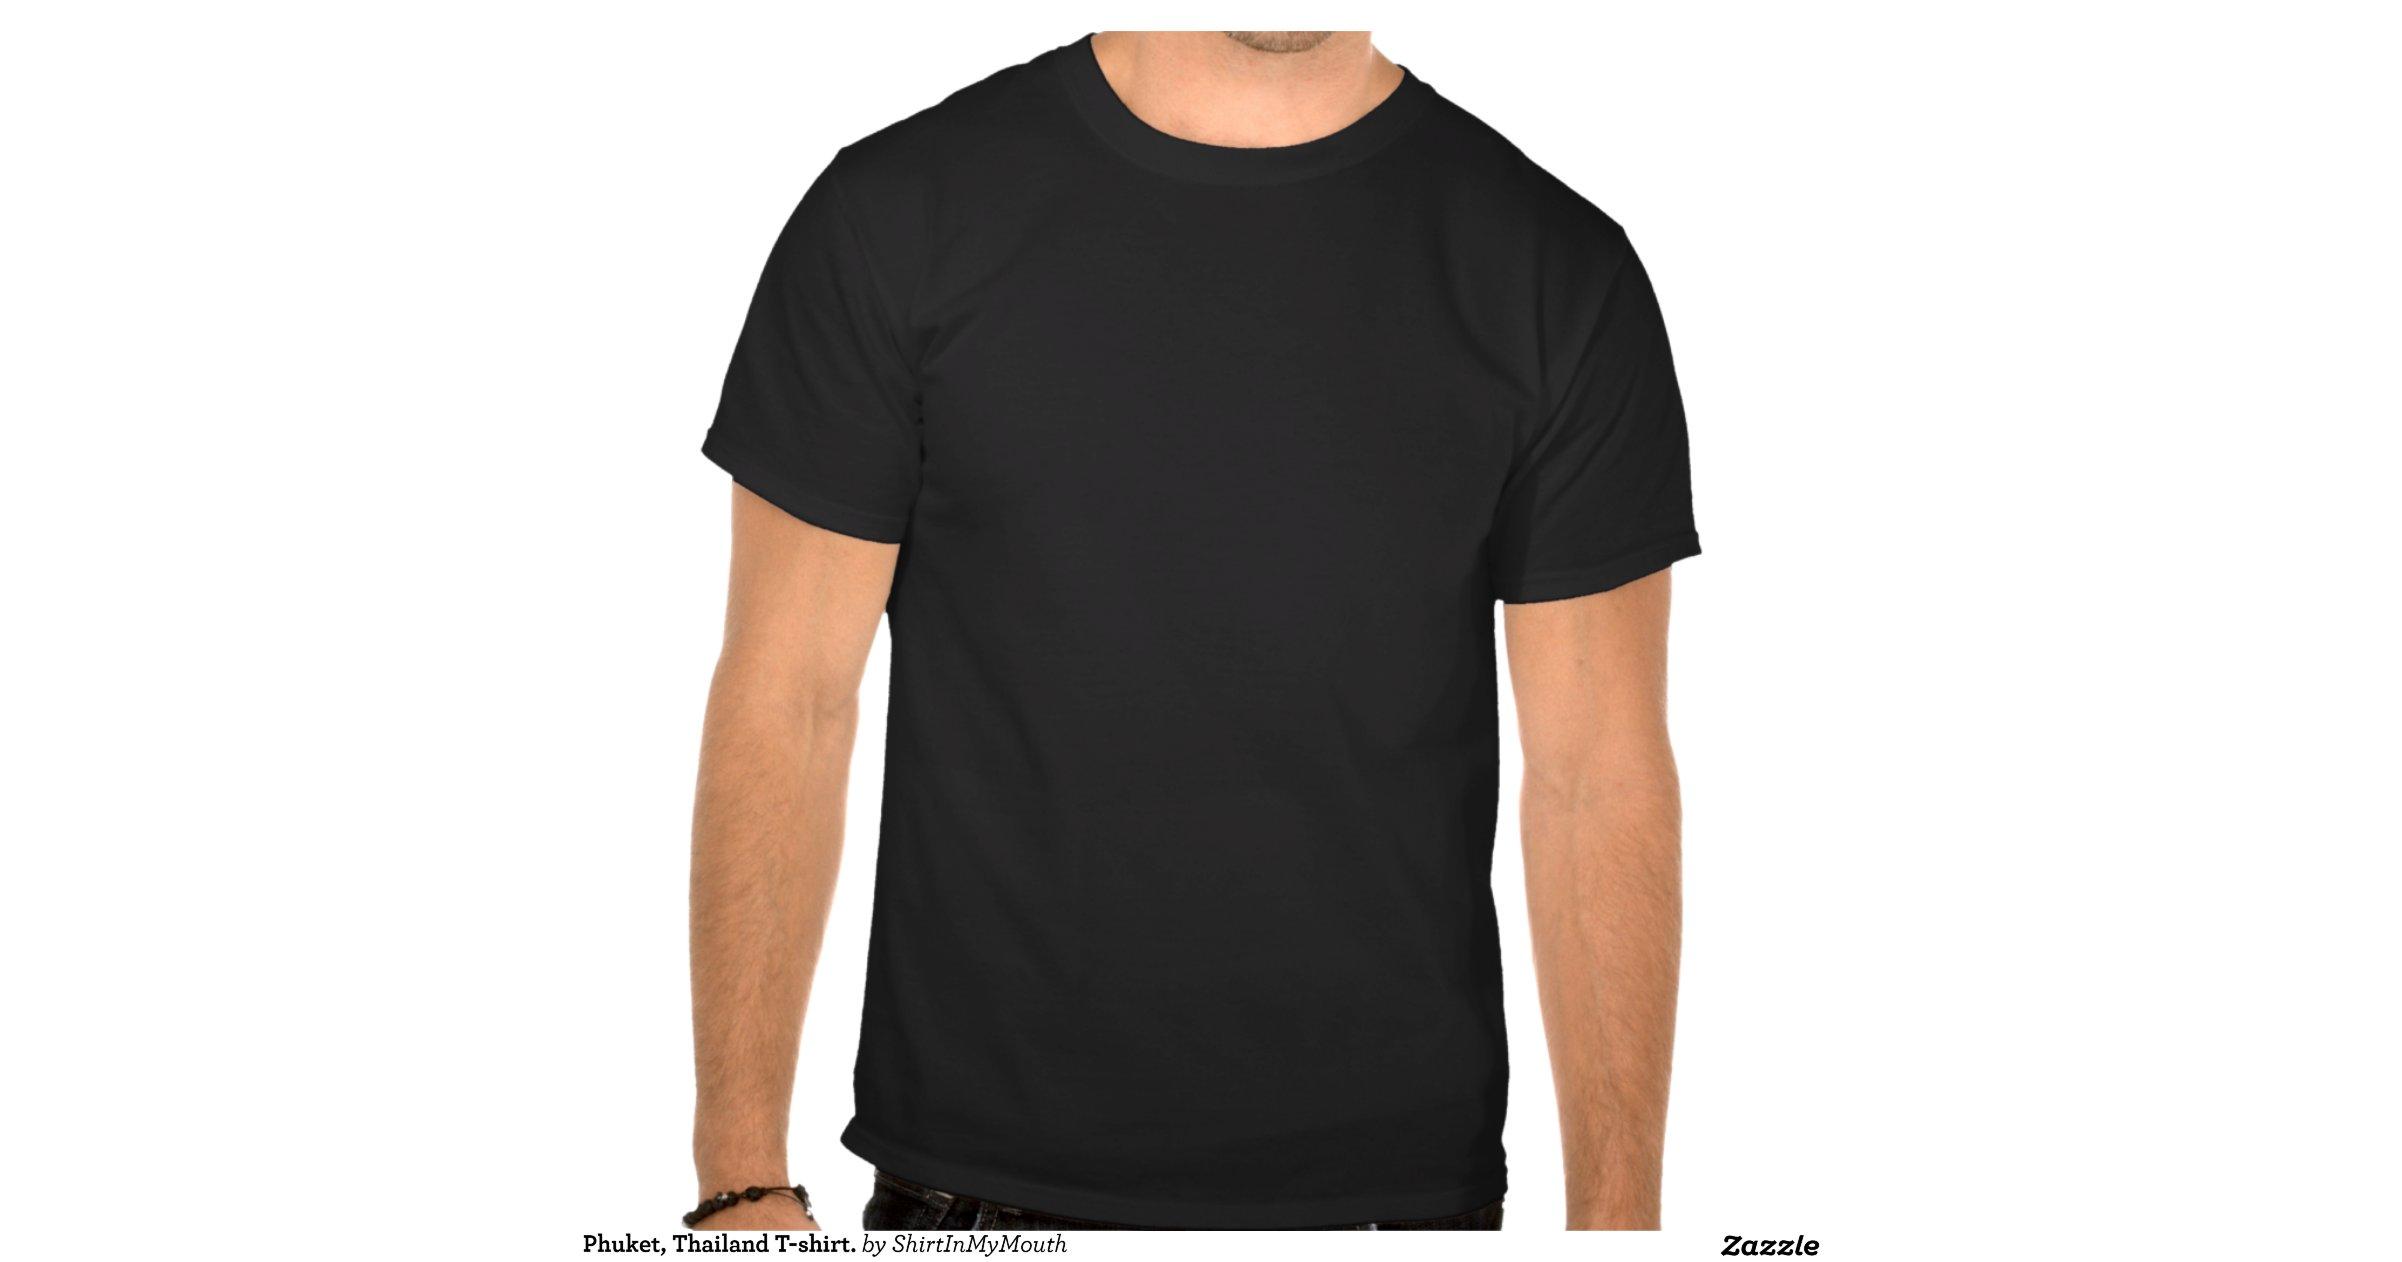 Phuket thailand t shirt shirts zazzle for T shirt printing thailand